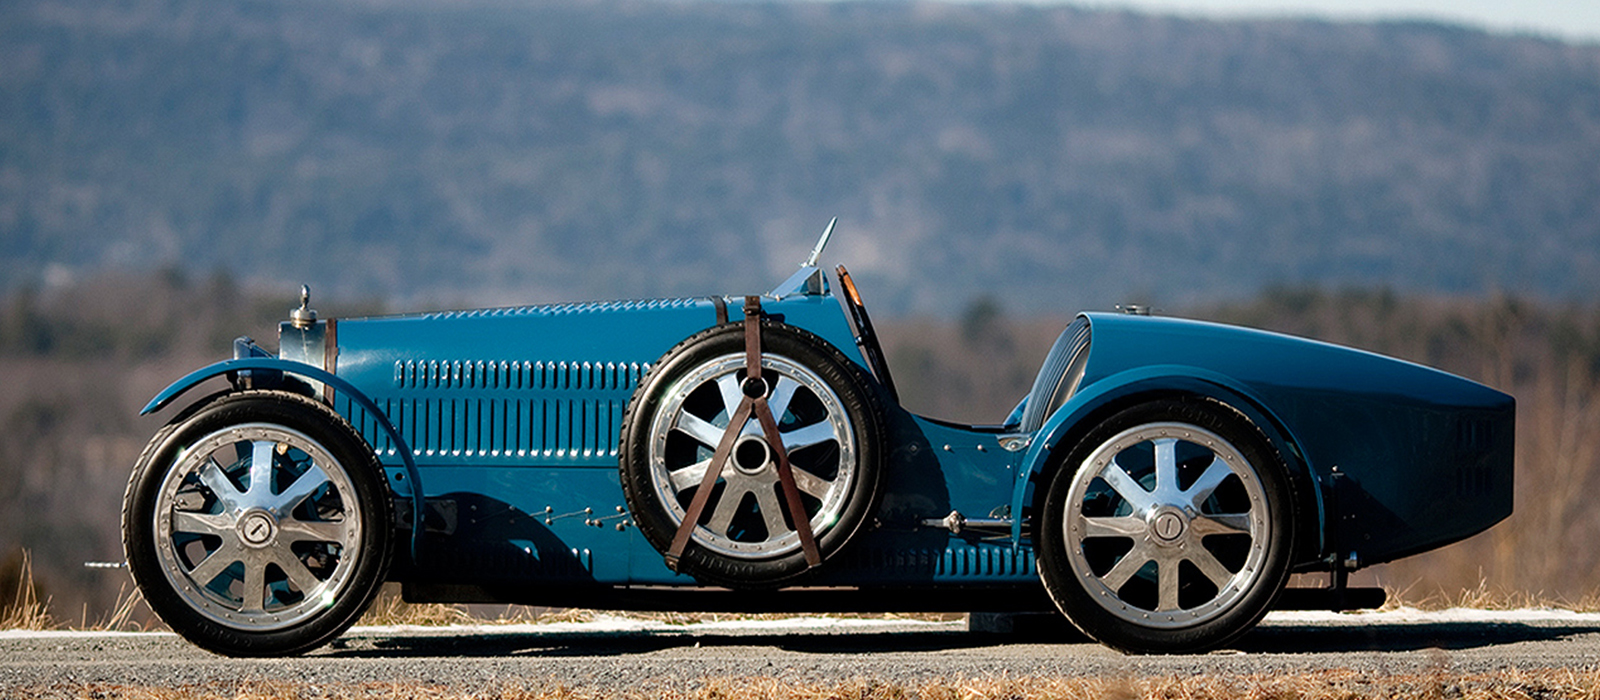 Bugatti Type 35 - Where it all started…